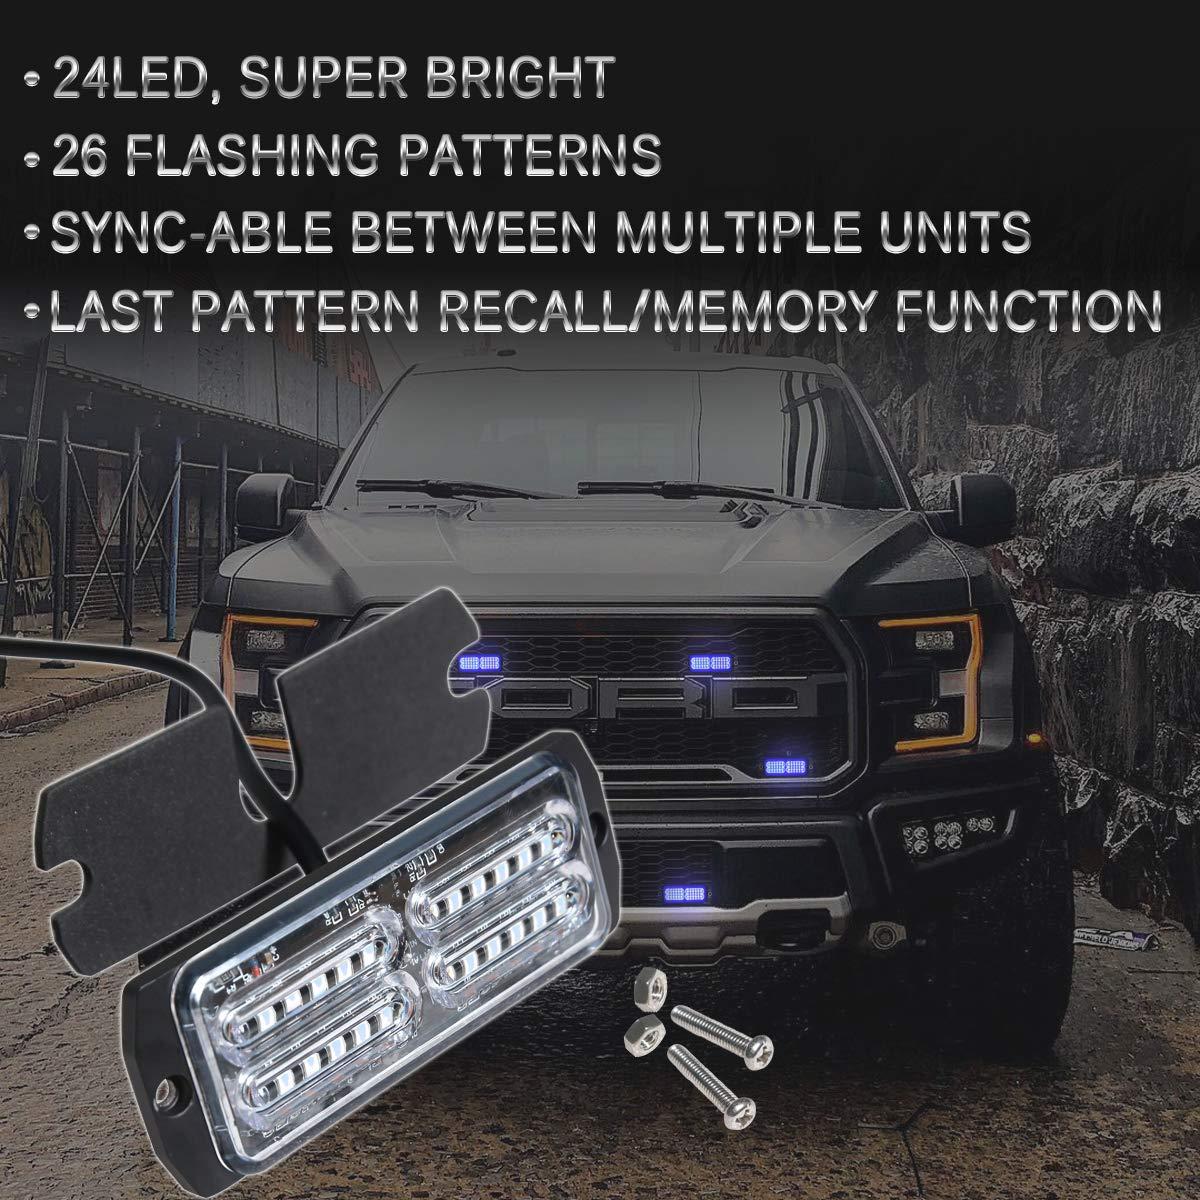 Amber//White ASPL 4pcs Sync Feature 24-LED Surface Mount Flashing Strobe Lights for Truck Car Vehicle LED Mini Grille Light Head Emergency Beacon Hazard Warning lights